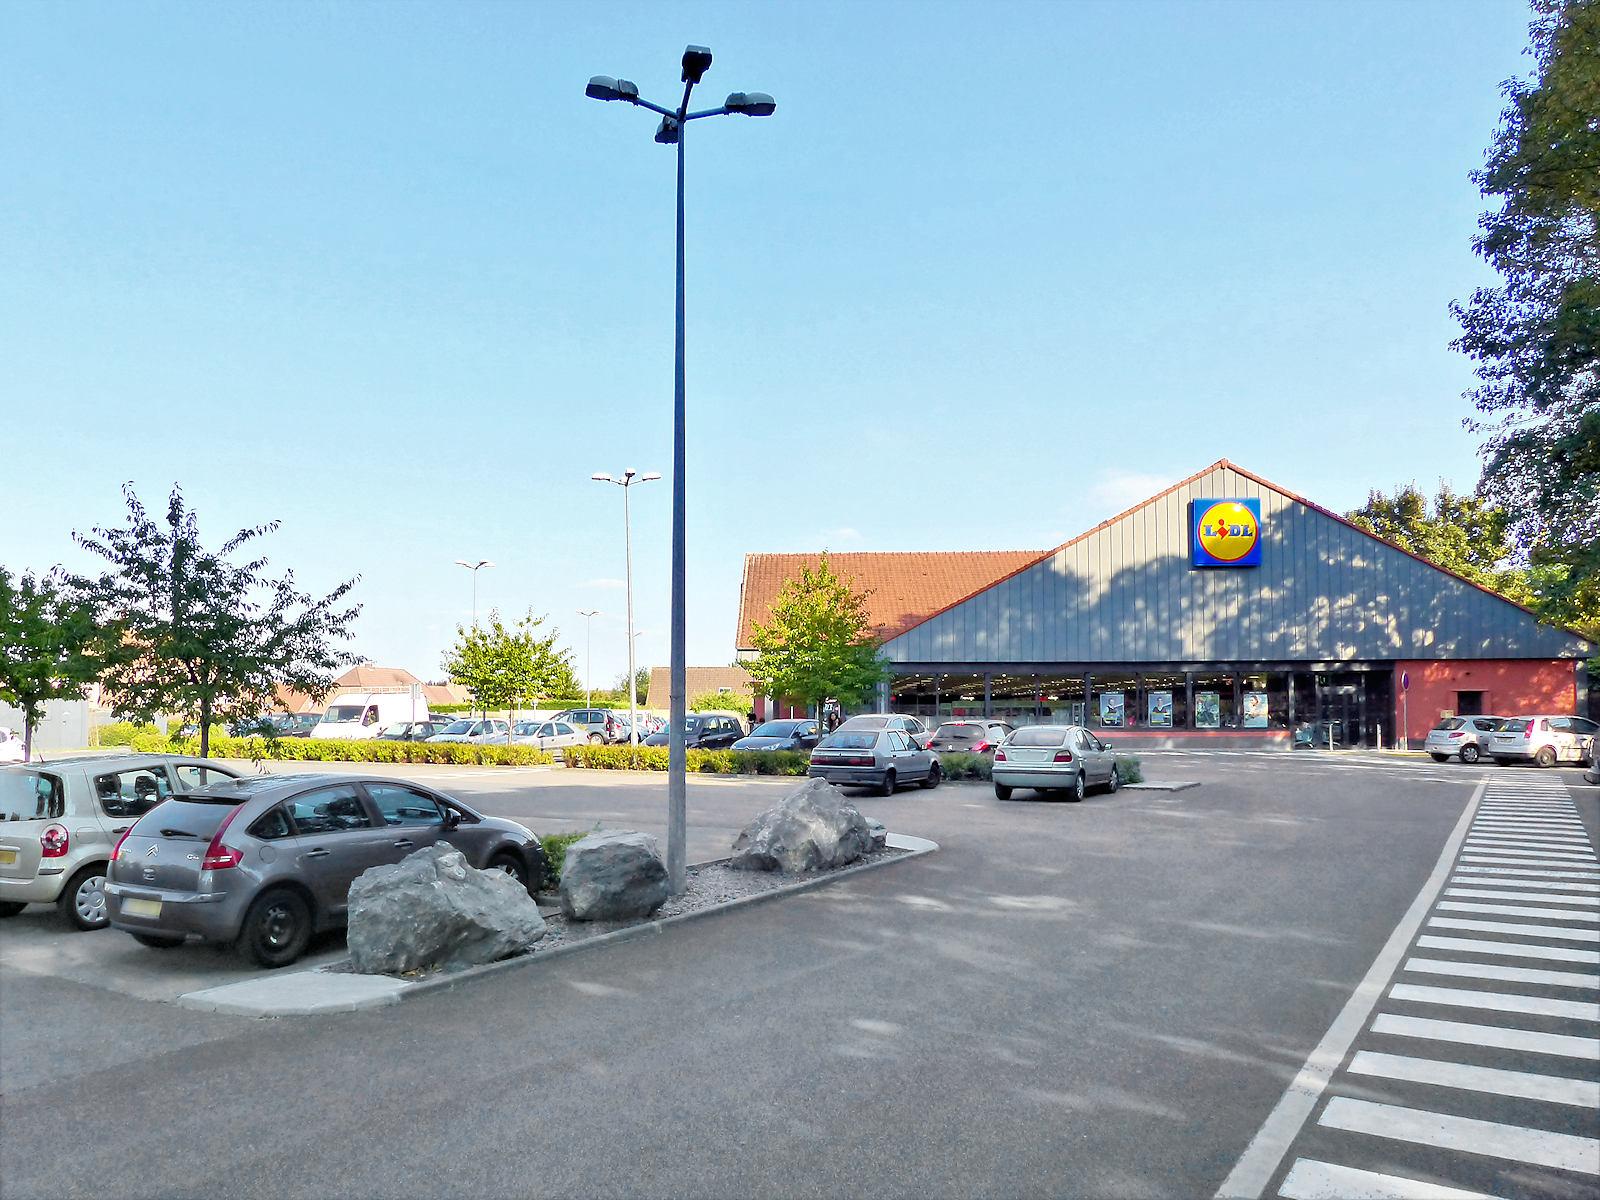 Supérettes Tourcoing - Lidl Levant Gare